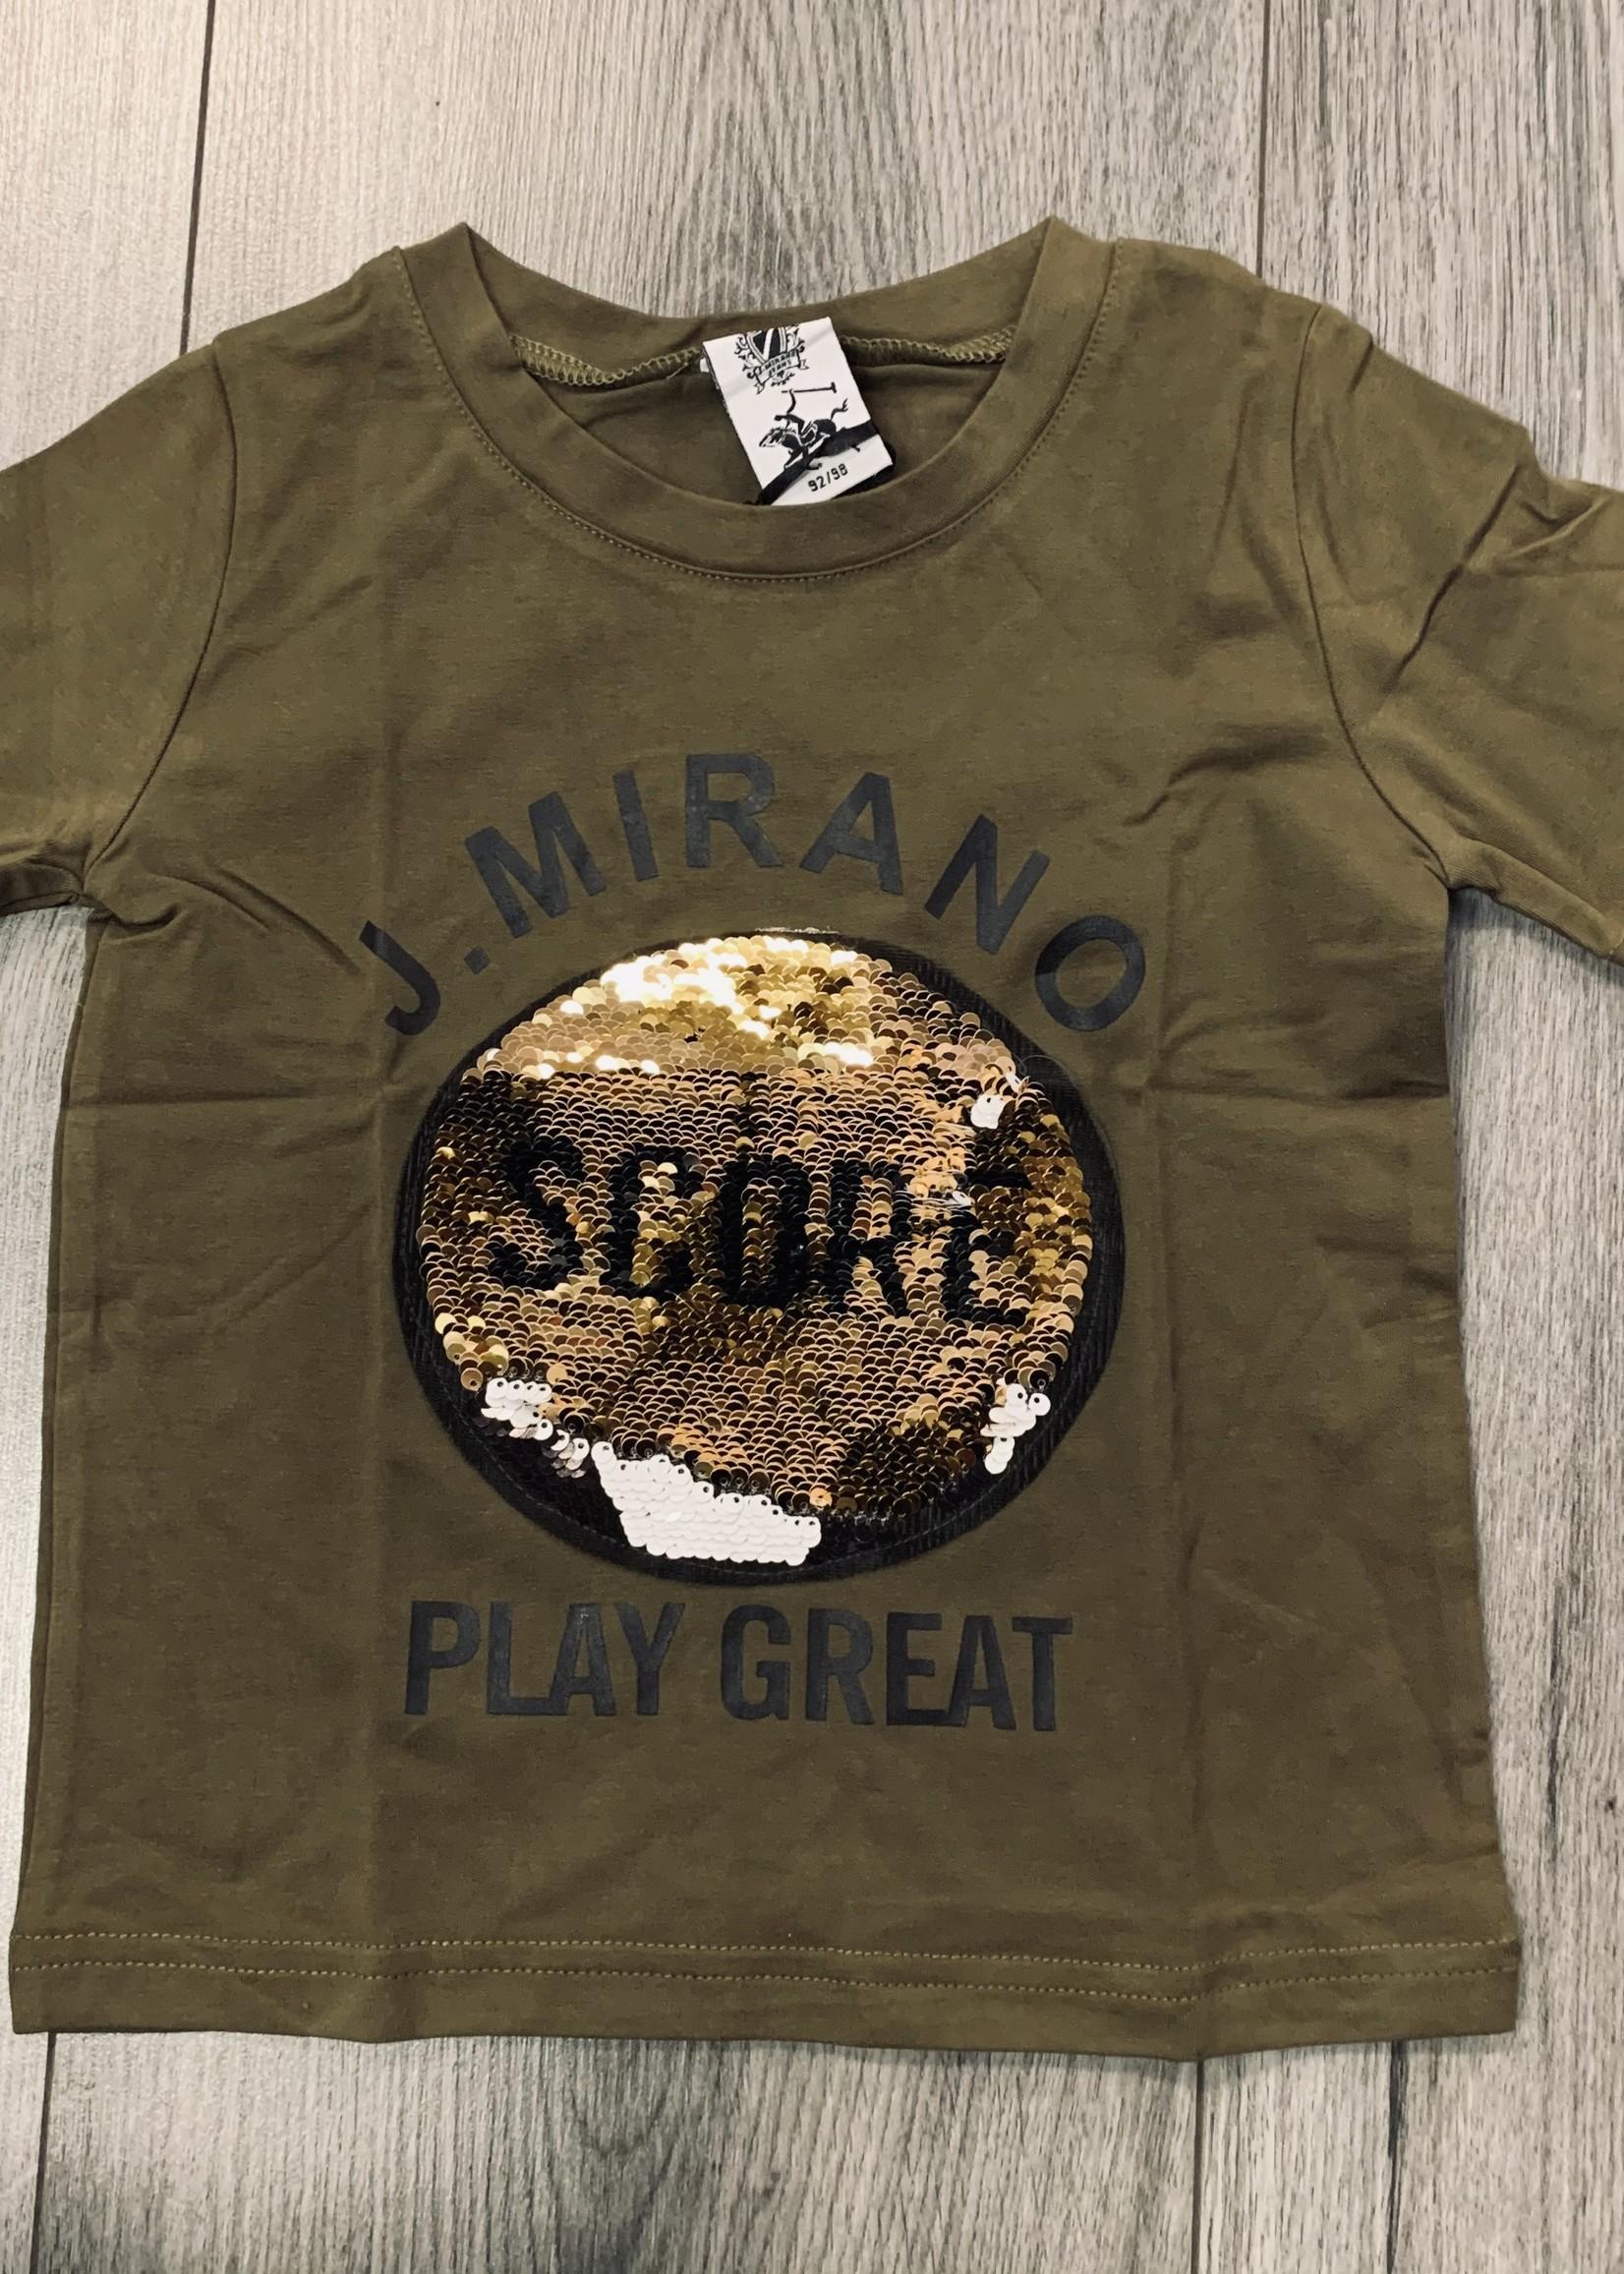 Divanis Divanis score shirt armygreen